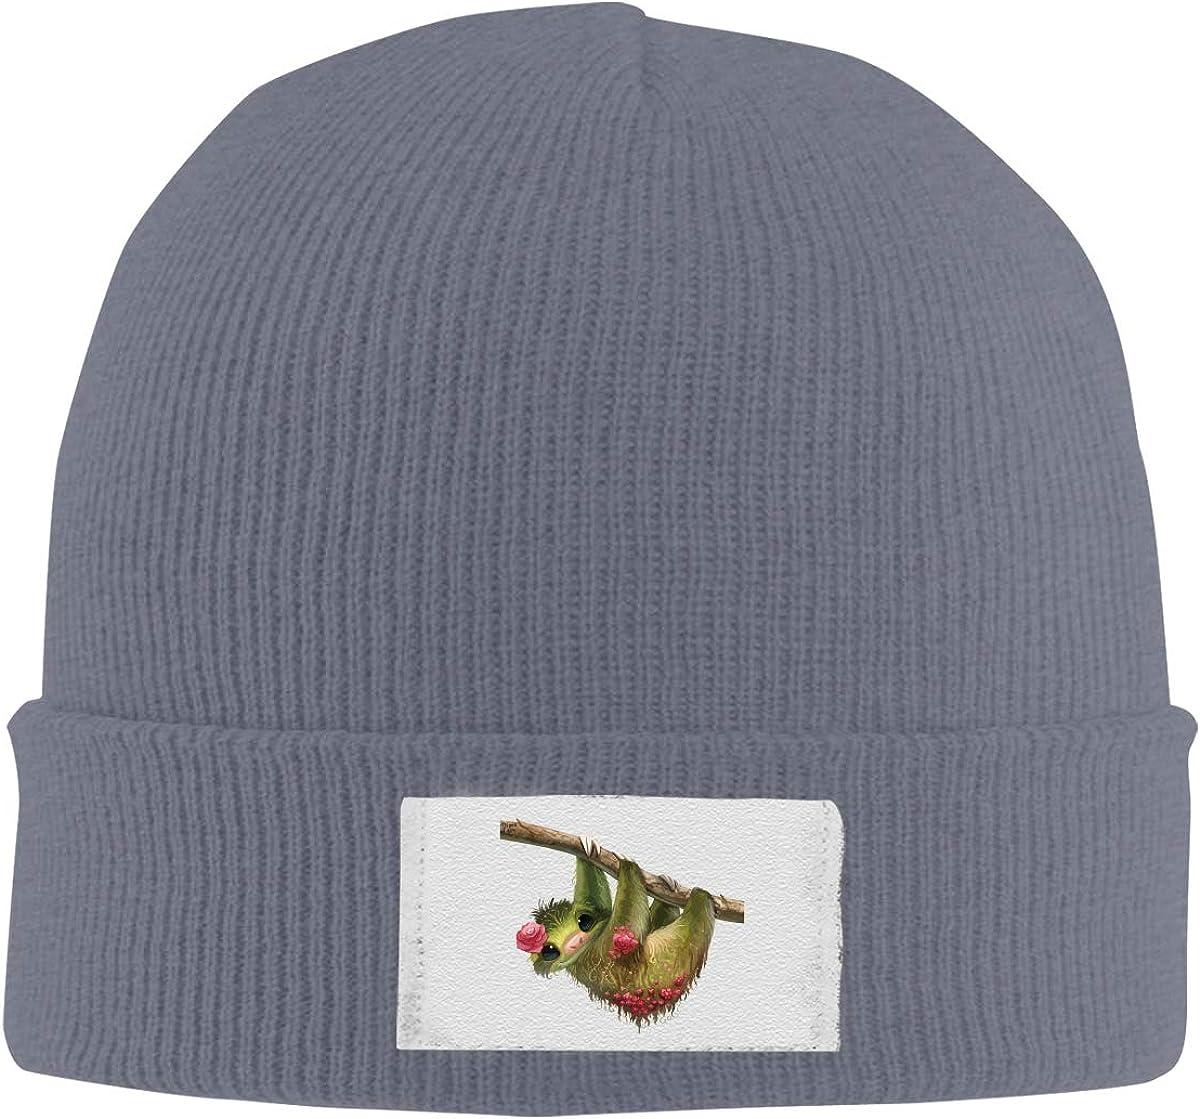 Dunpaiaa Skull Caps Elegant Sloth Winter Warm Knit Hats Stretchy Cuff Beanie Hat Black